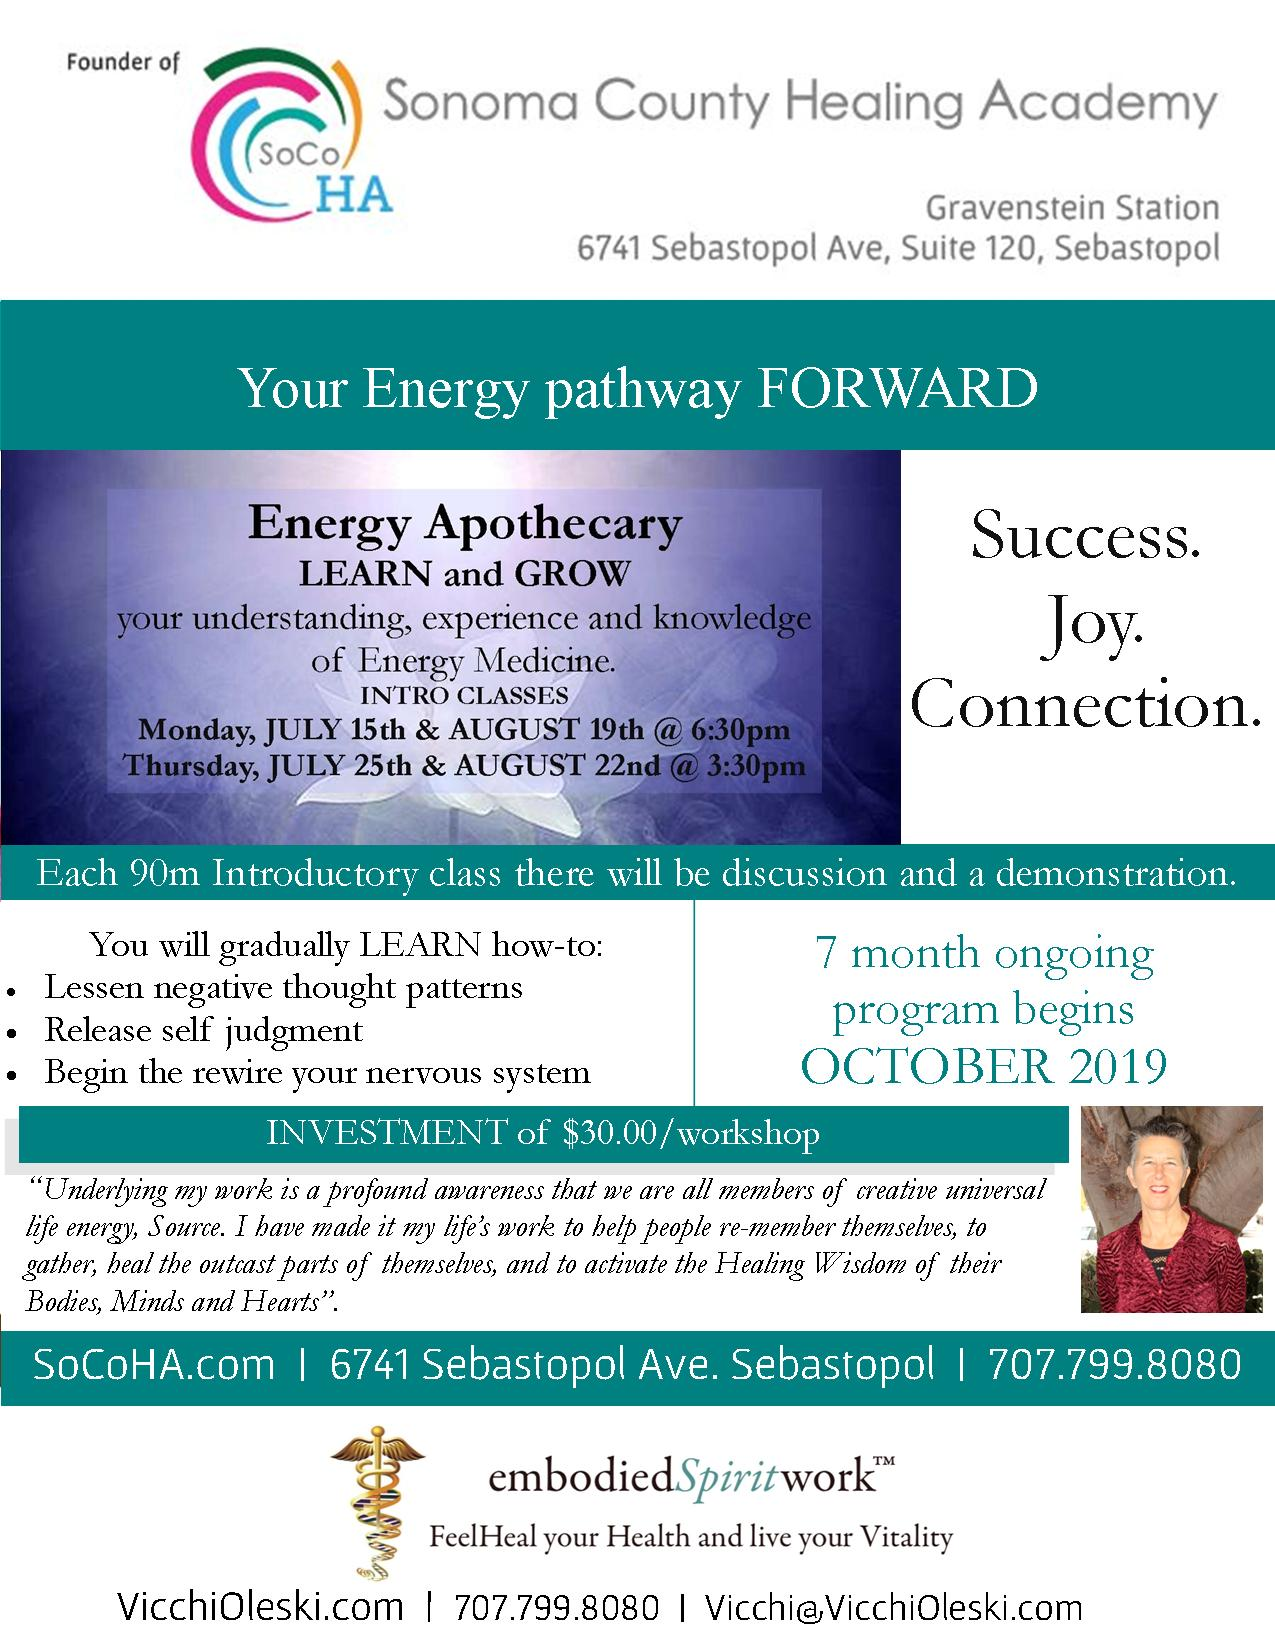 Intro Classes, Energy Apothecary